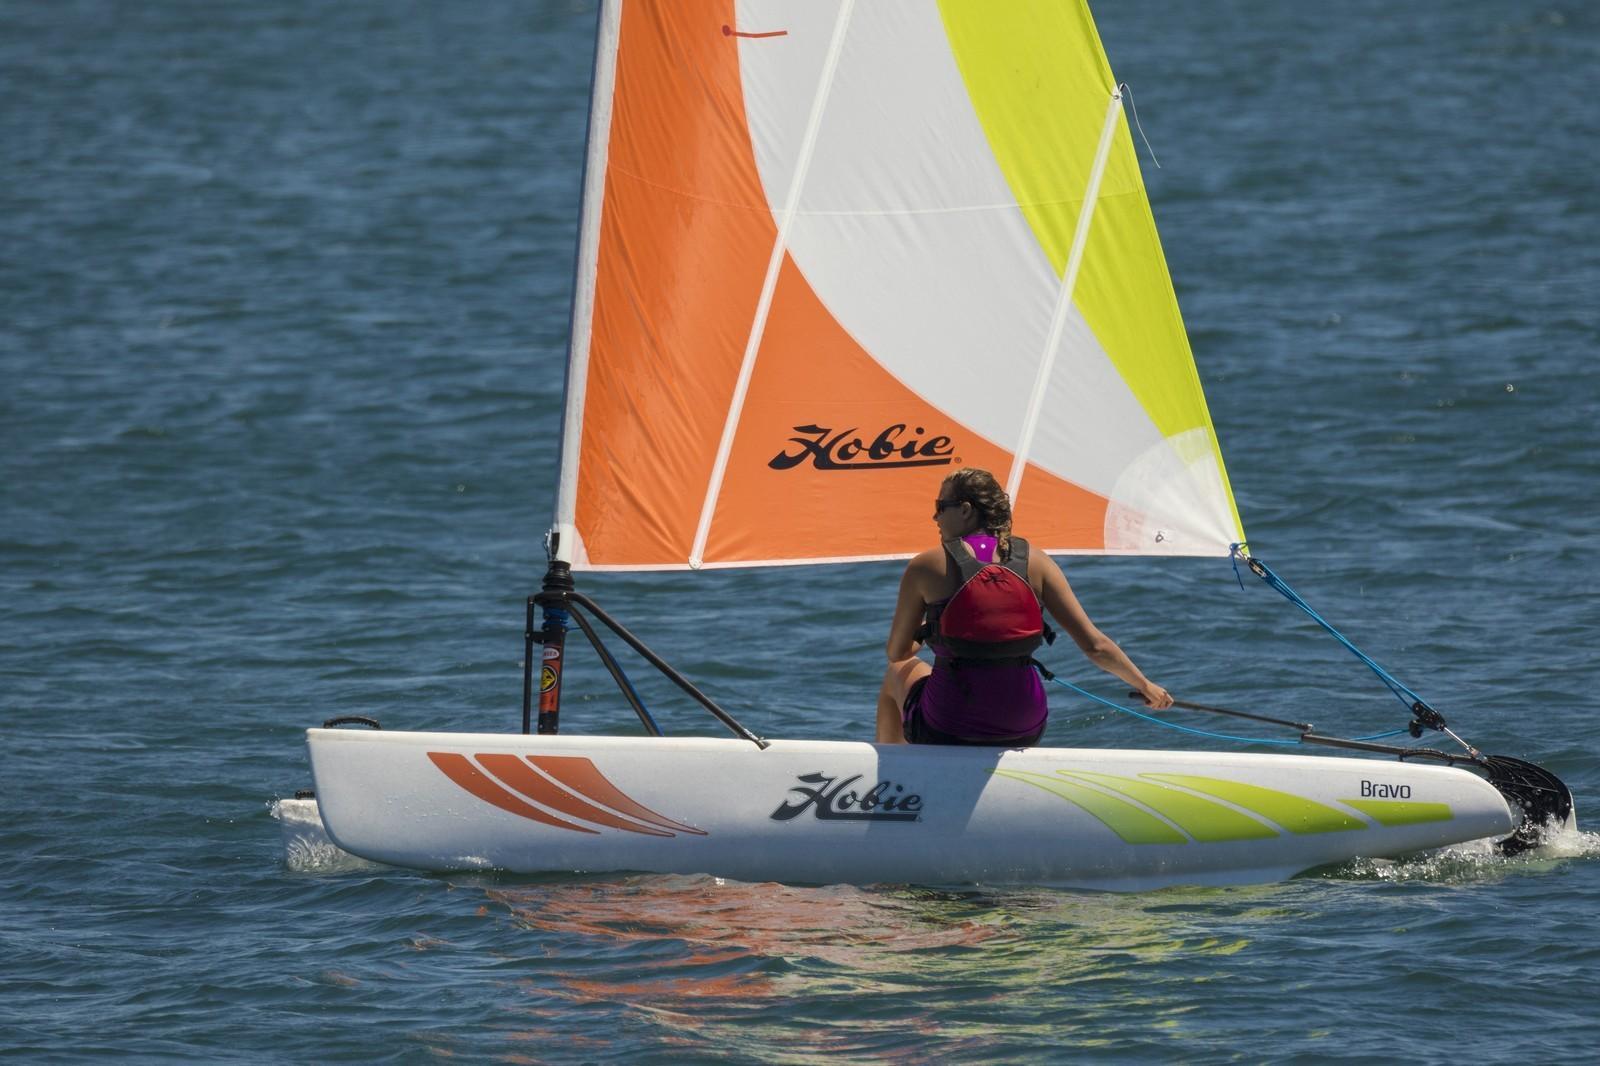 2019 Hobie Cat Bravo, Fort Lauderdale Florida - boats com